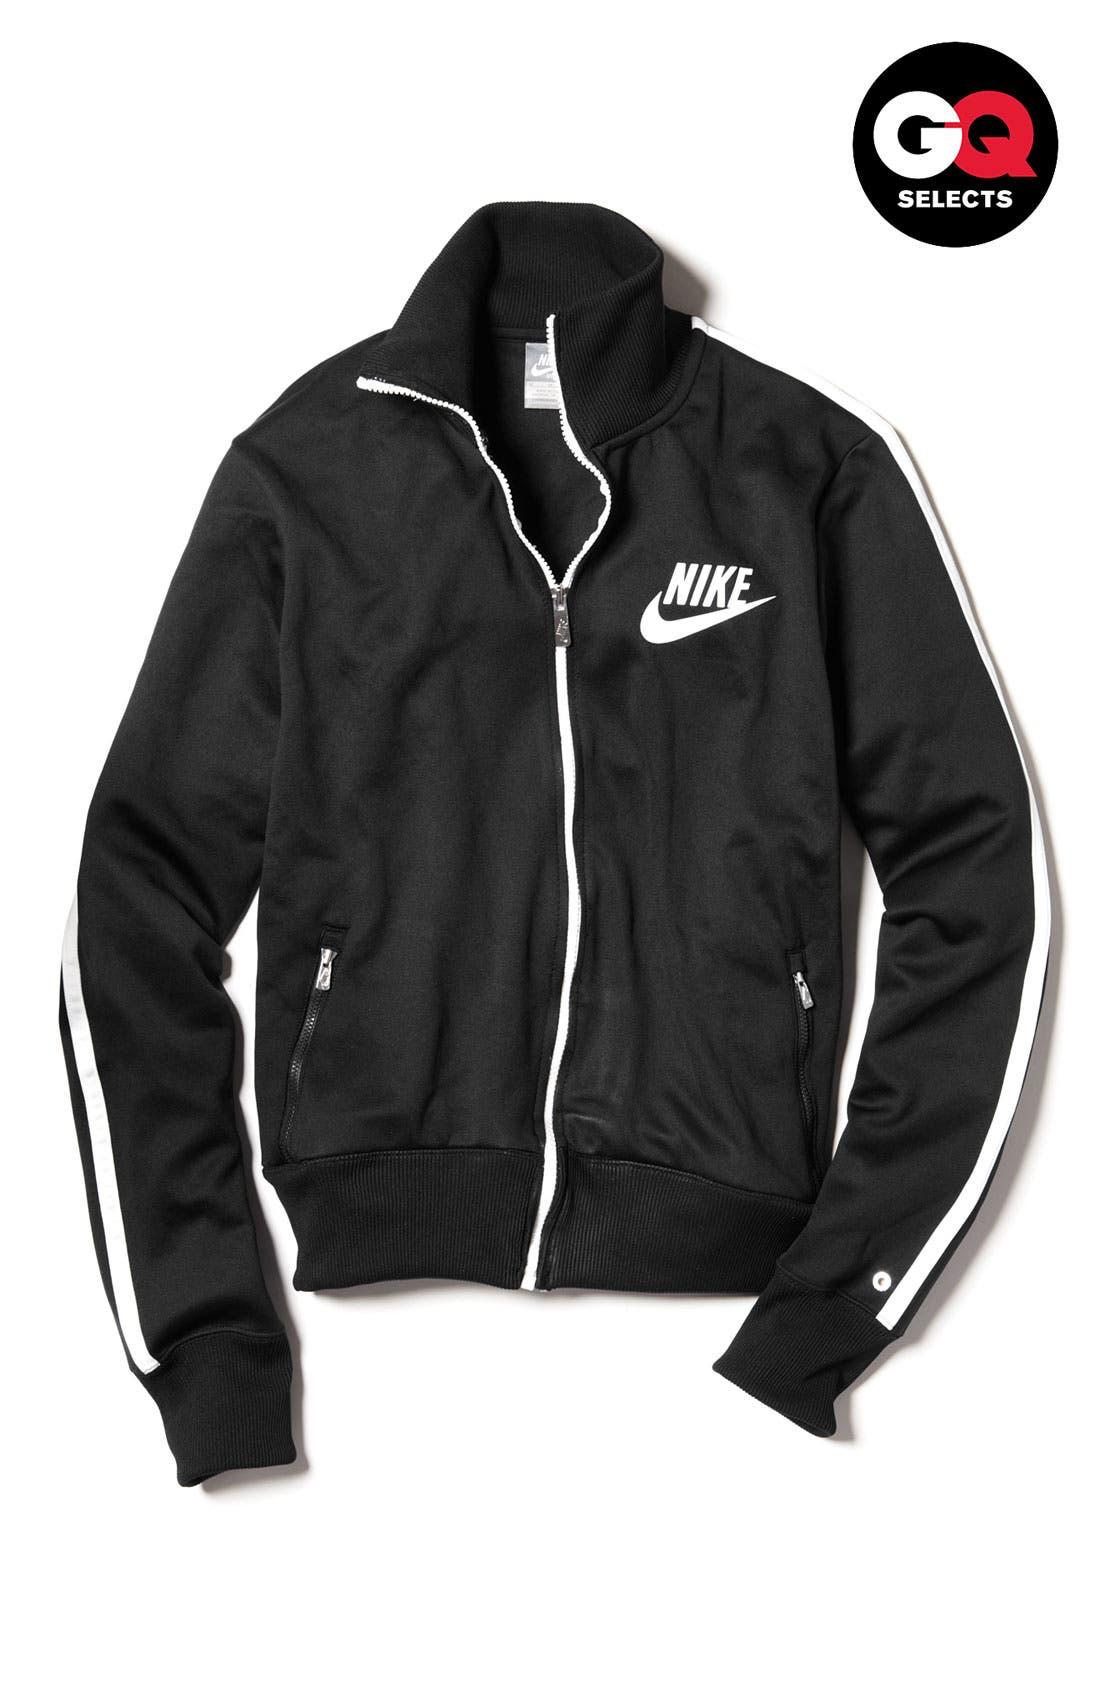 Alternate Image 1 Selected - Nike 'HBR' Track Jacket (Online Exclusive)